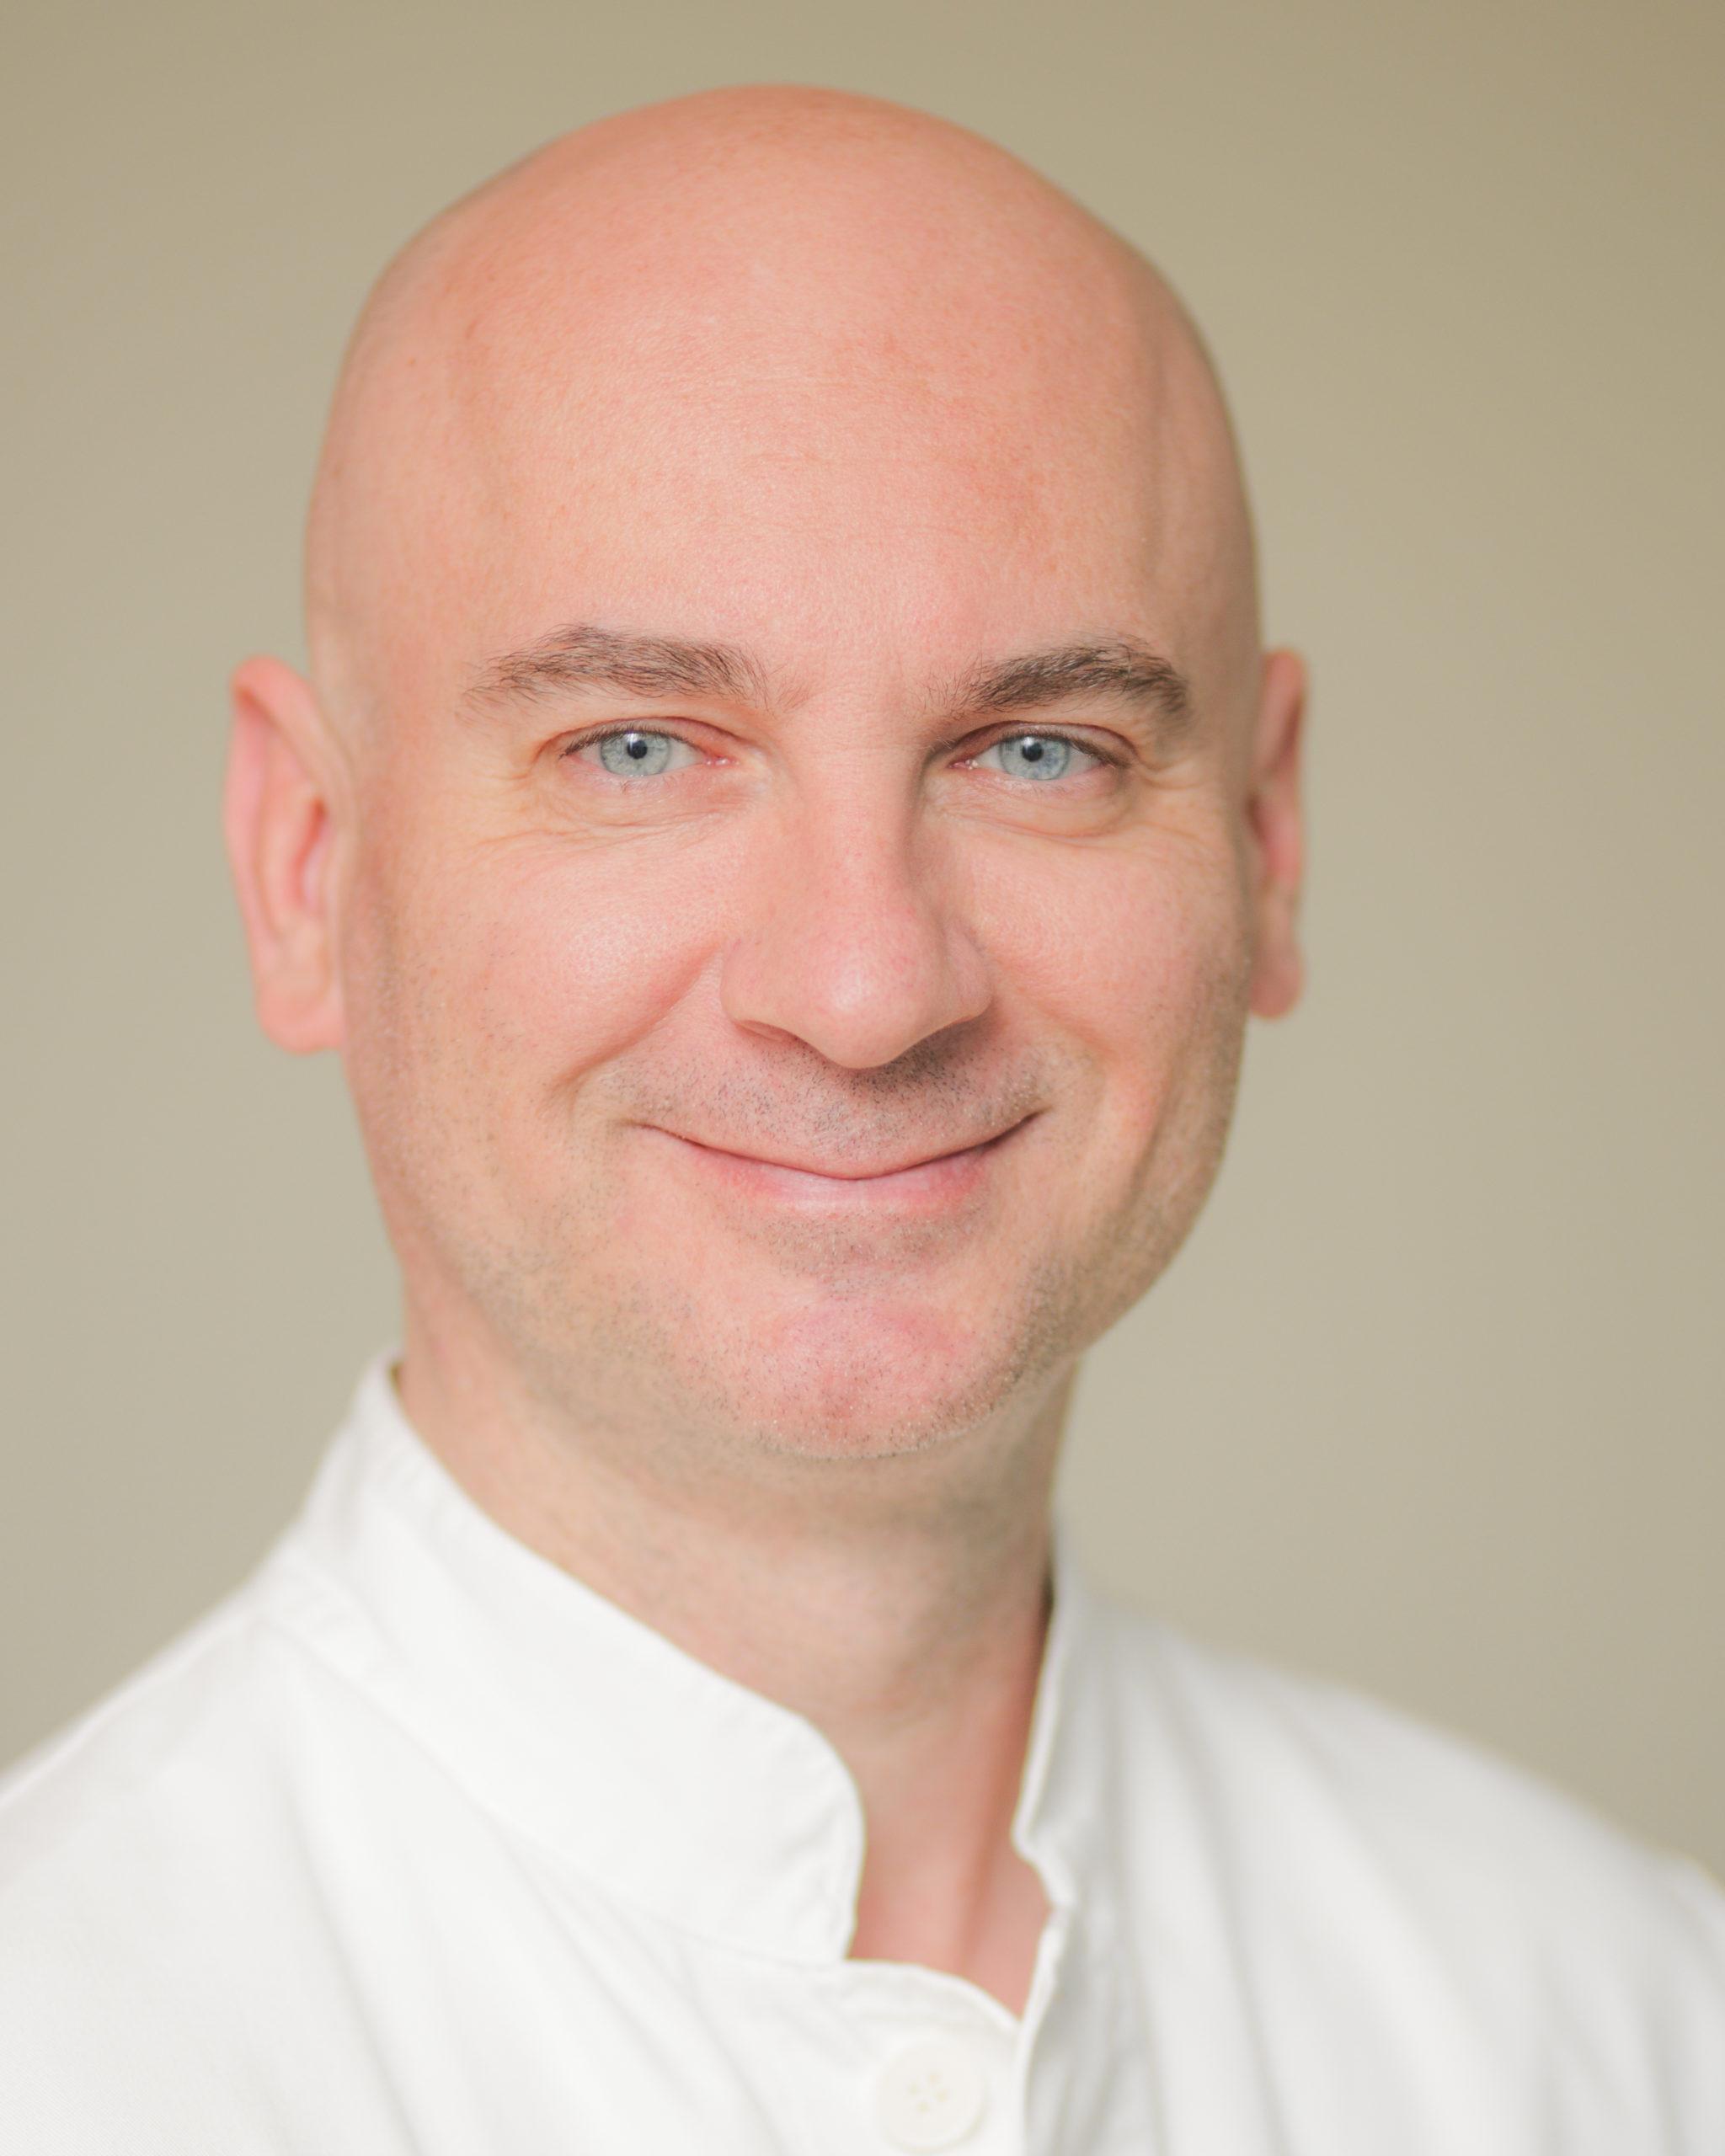 prim. Andrej Radić, dr.med. – orthopedist, FEBOT